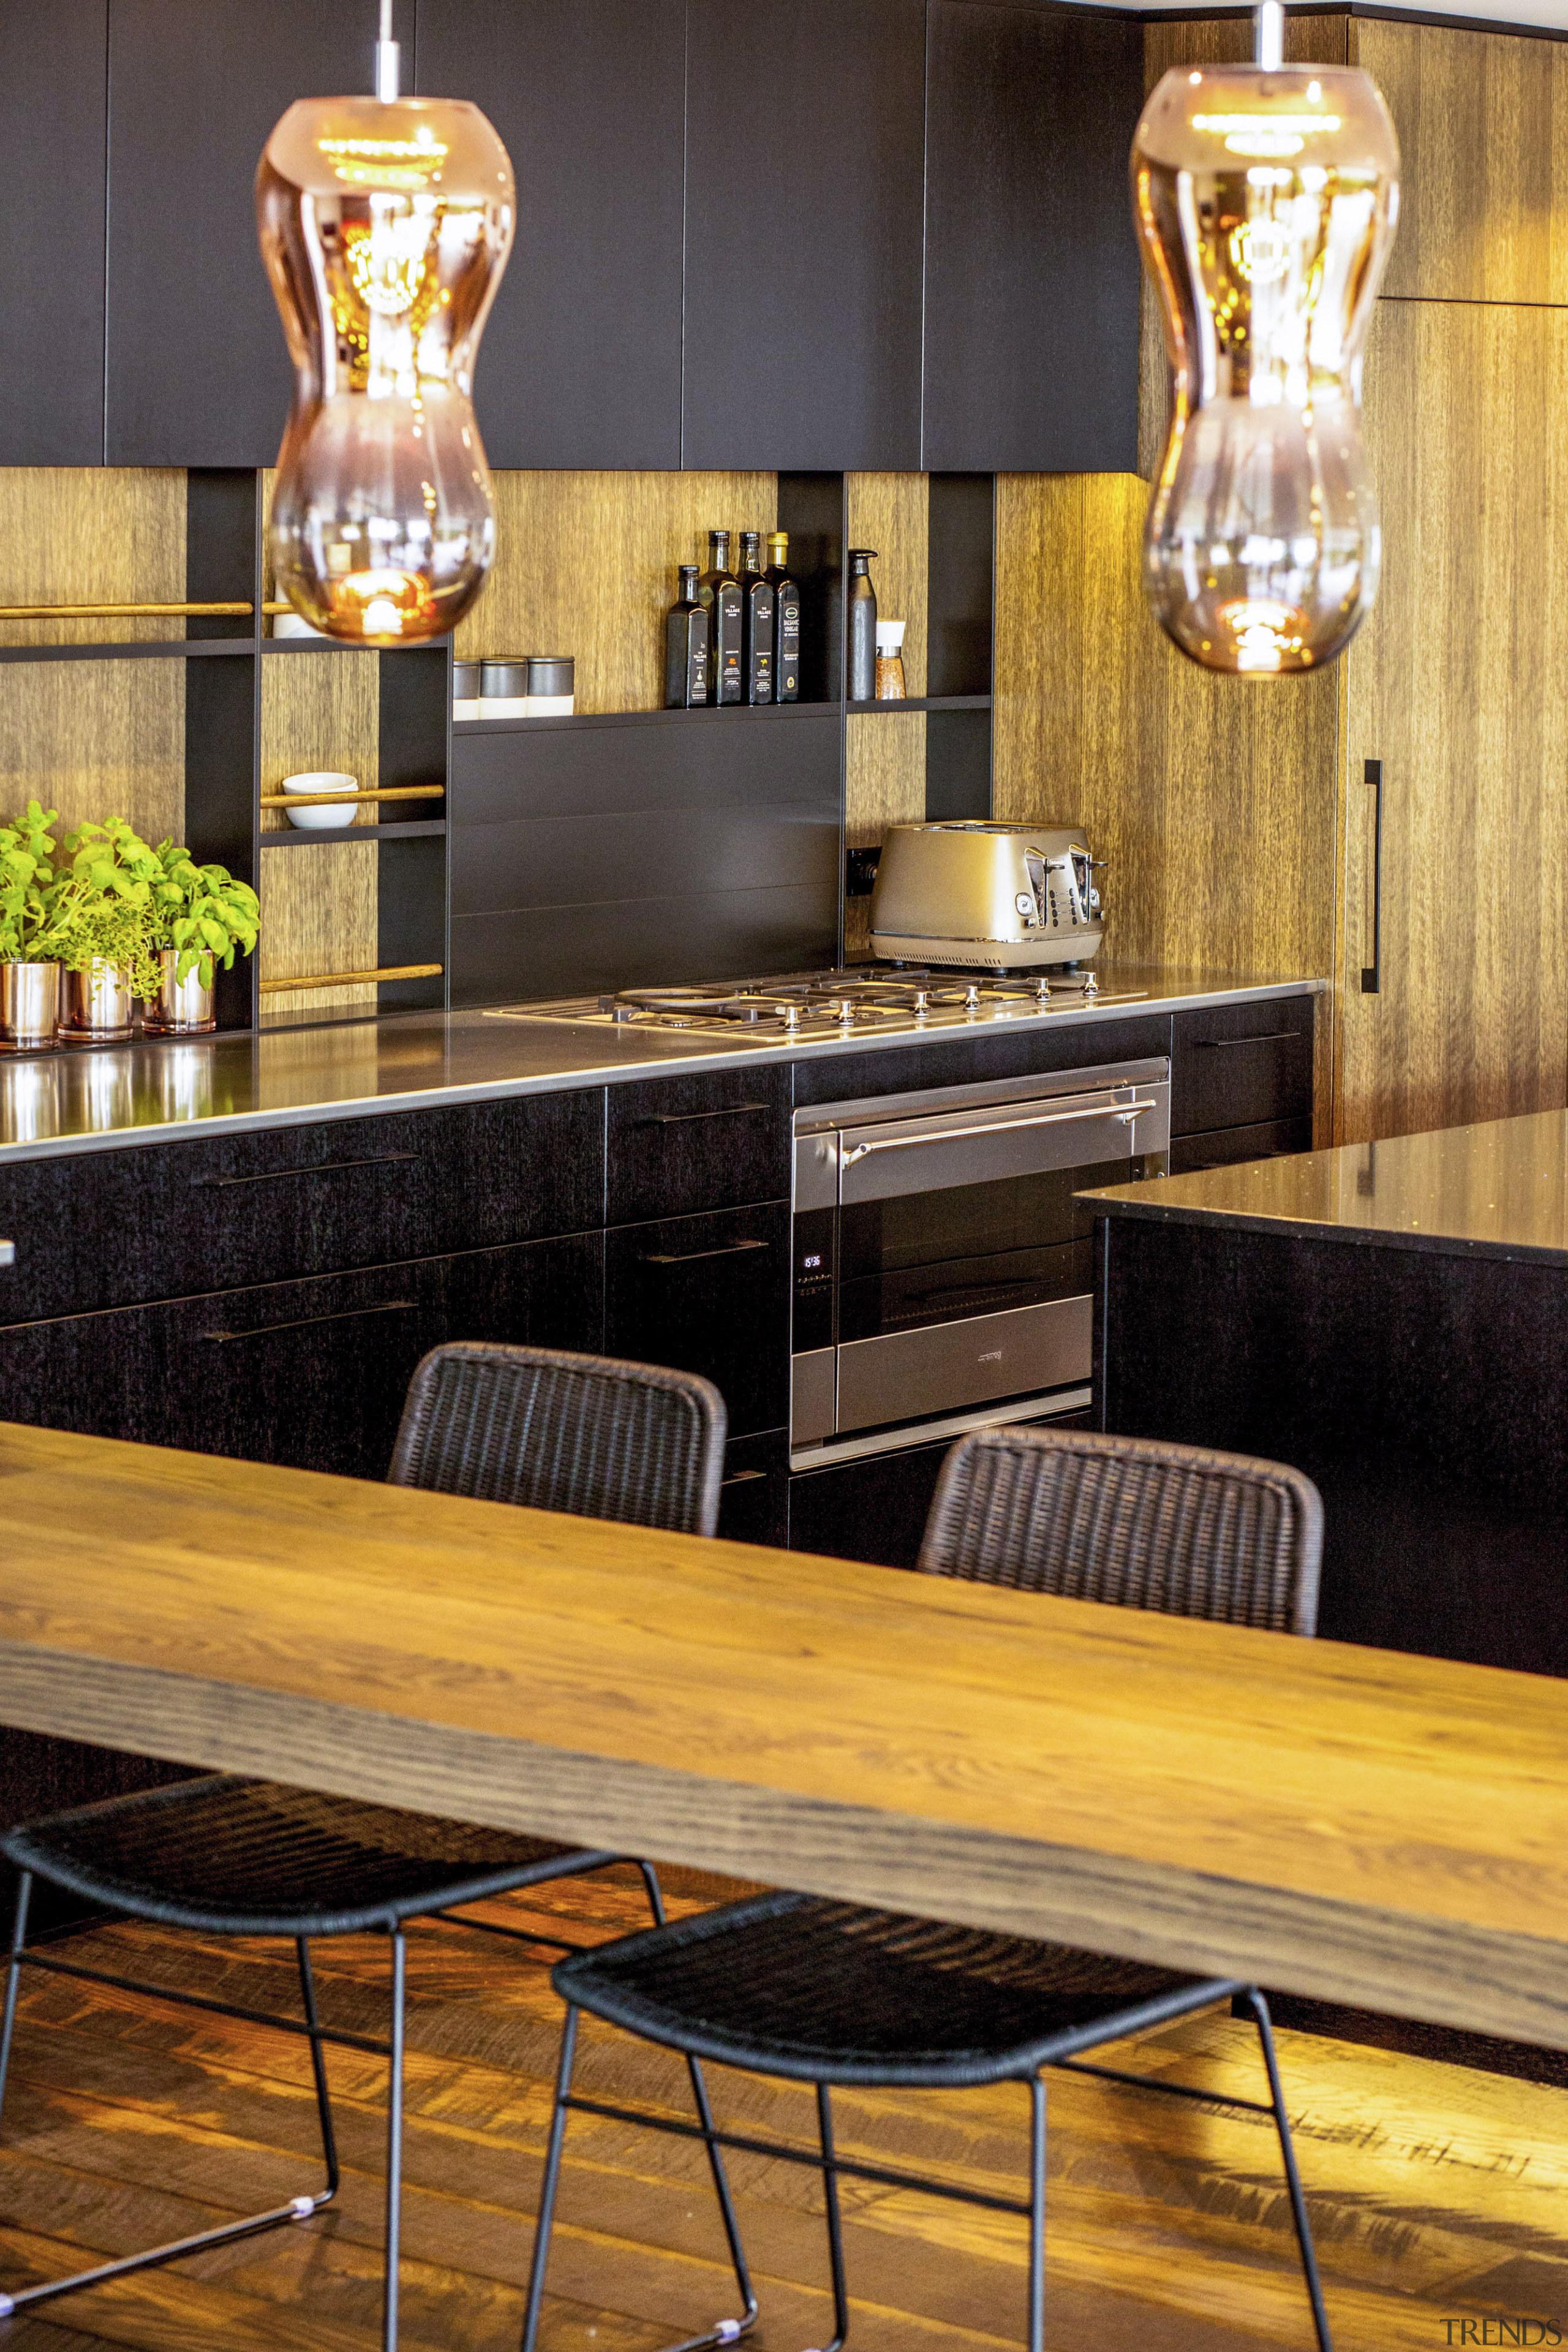 A sleek Smeg oven and cooktop were chosen furniture, interior design, restaurant, table, wood, orange, black